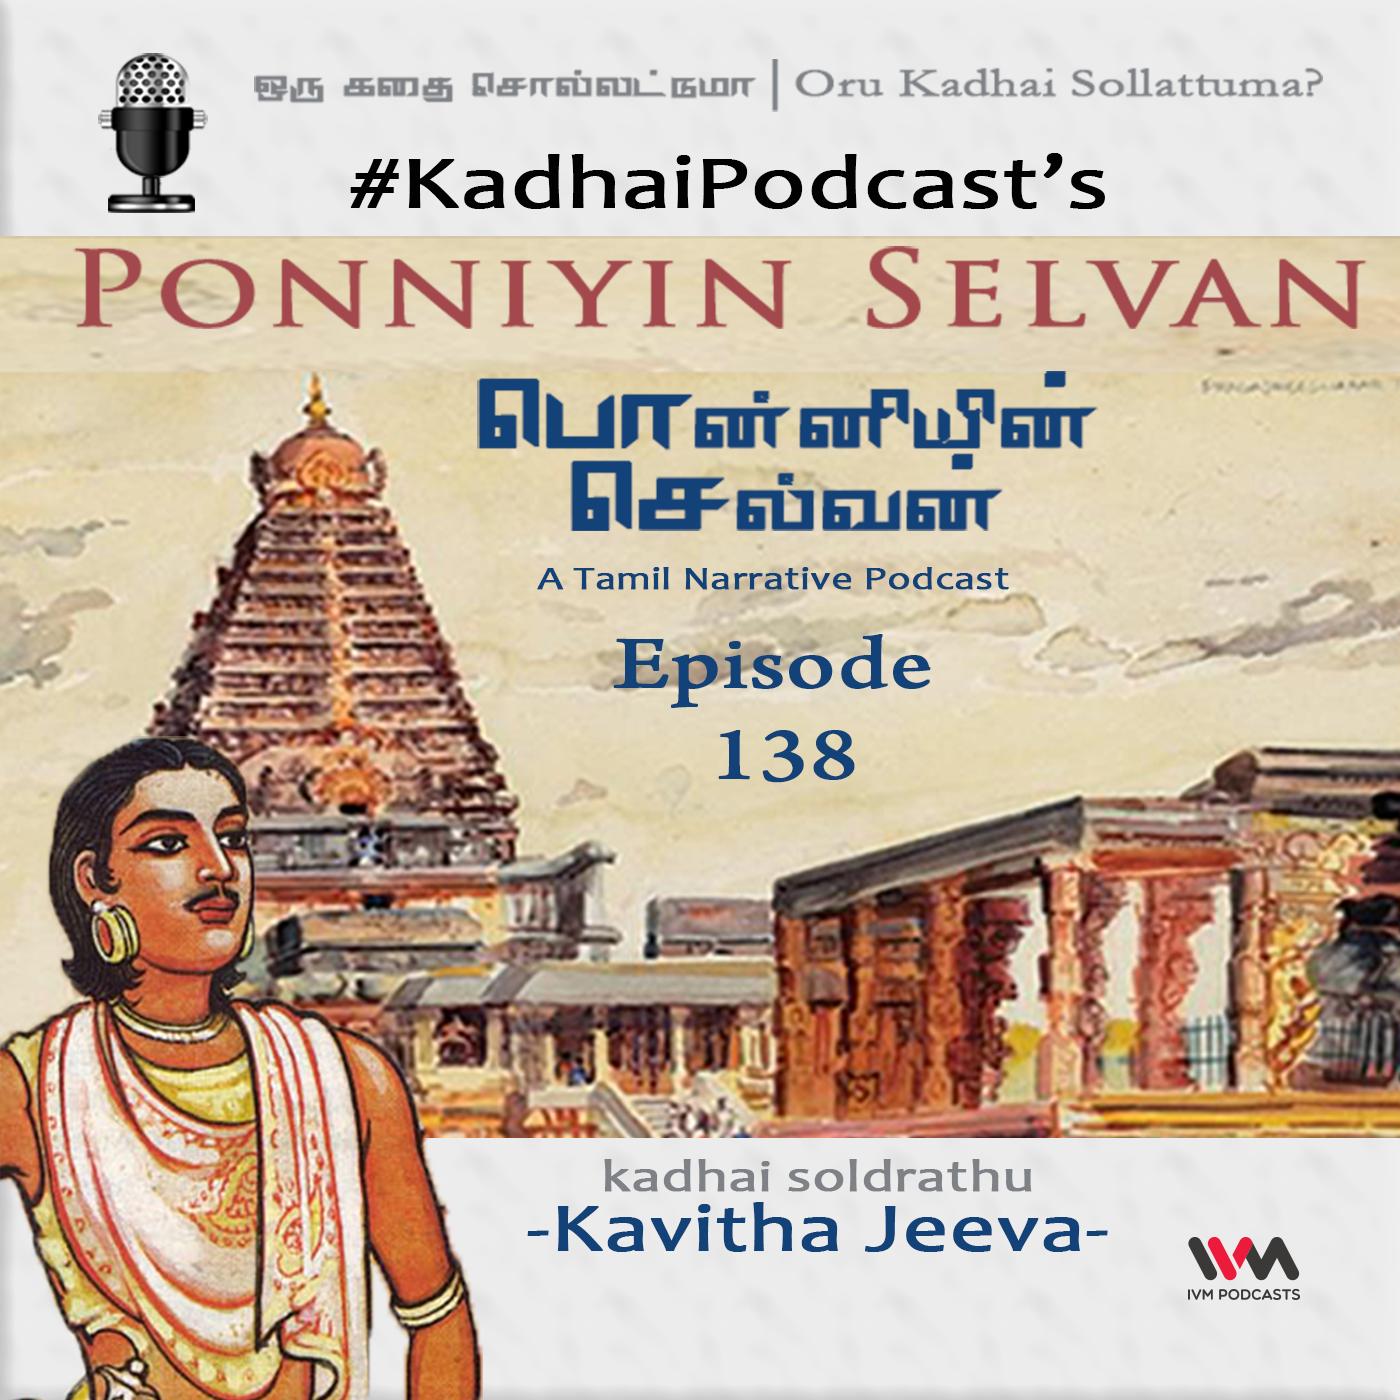 KadhaiPodcast's Ponniyin Selvan - Episode # 138